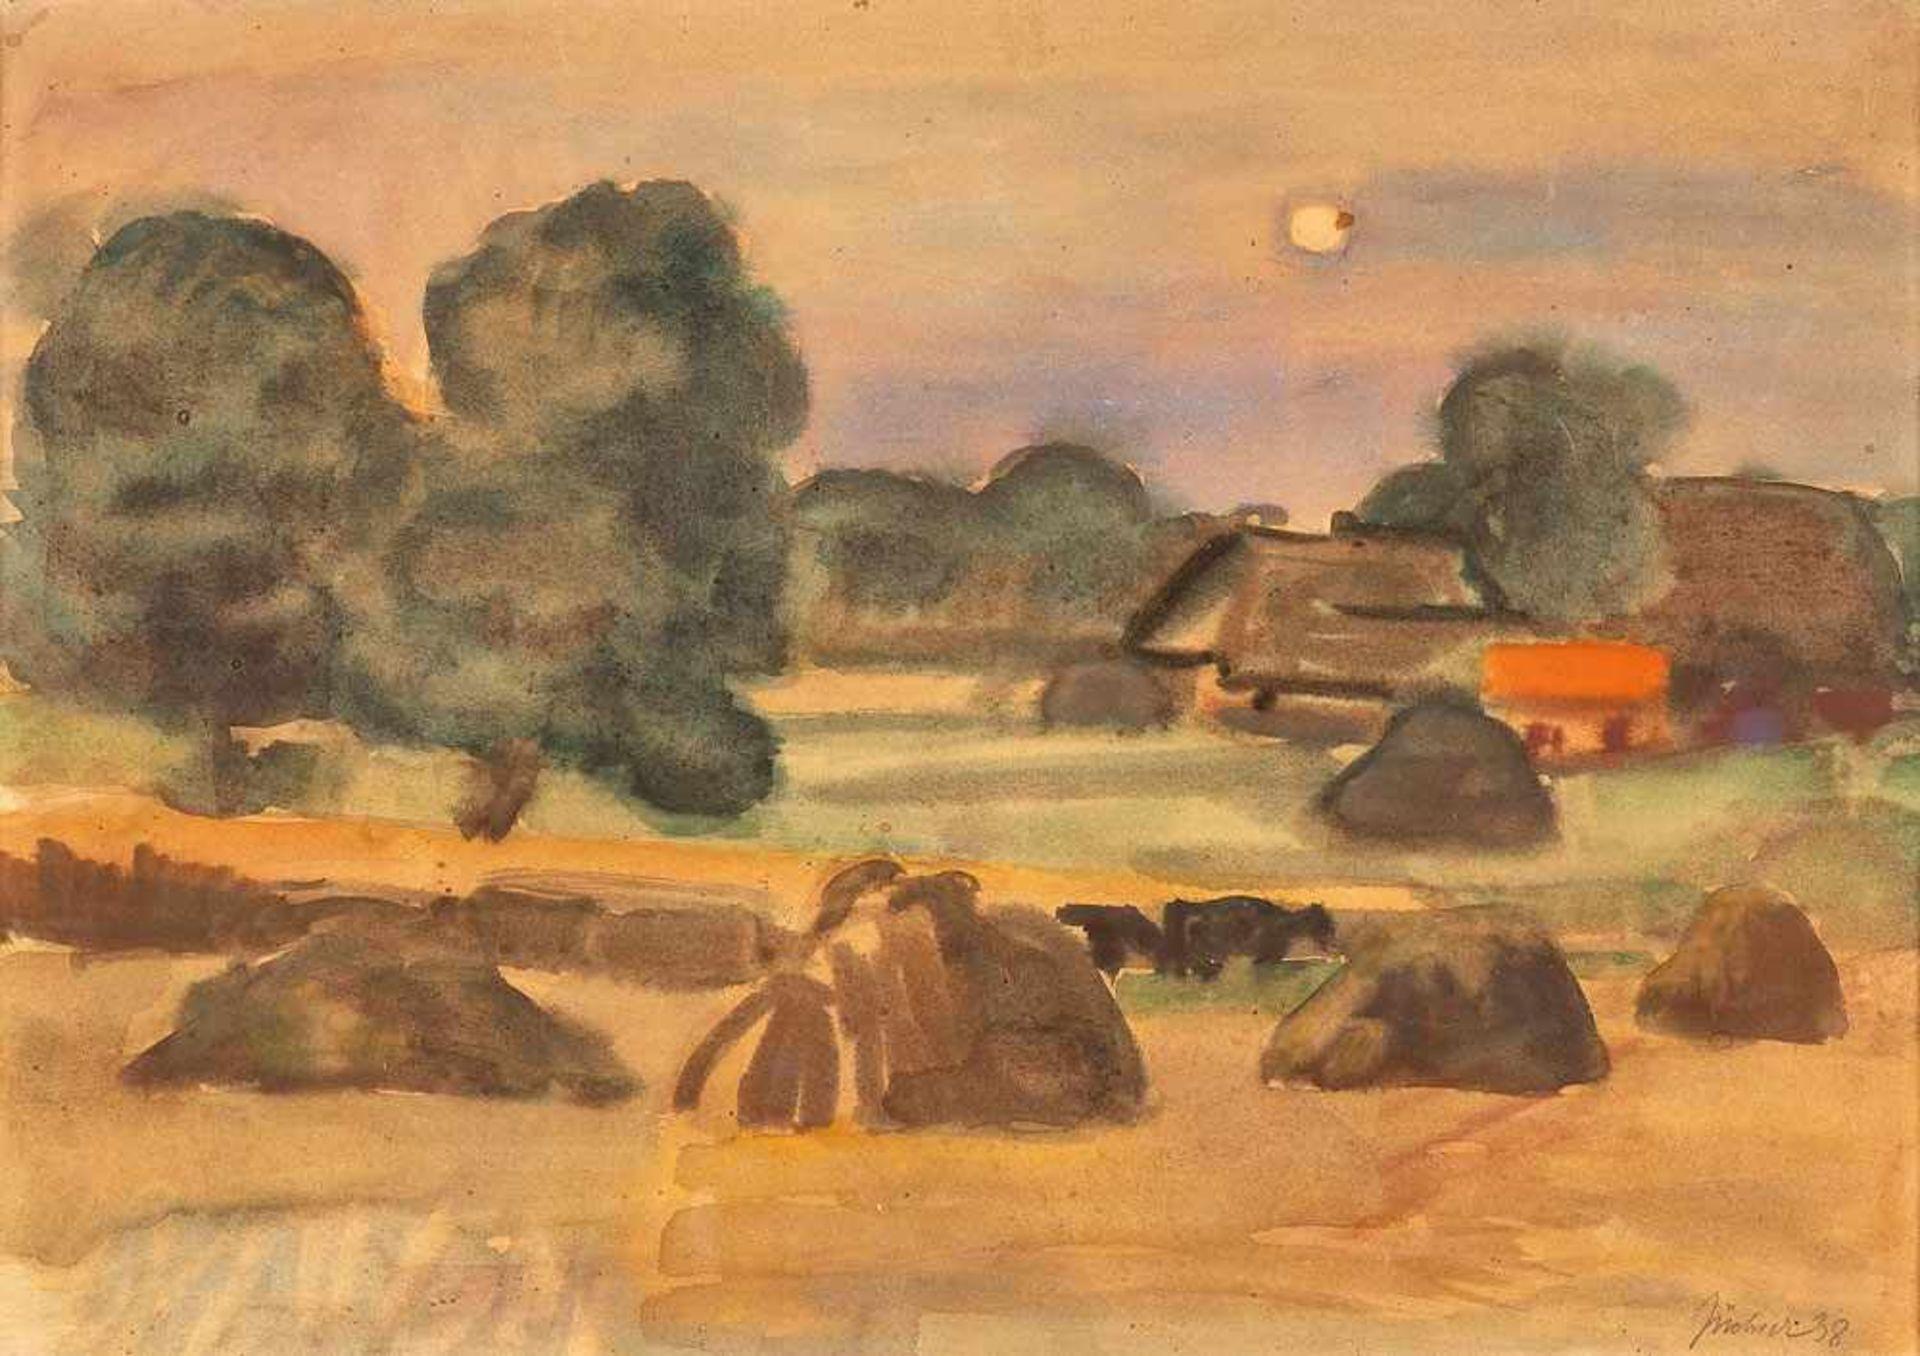 Hans Jüchser (1894 Chemnitz - 1977 Dresden)Pommerscher Hof im Spätsommer.Aquarell. 1938. 355 x 500